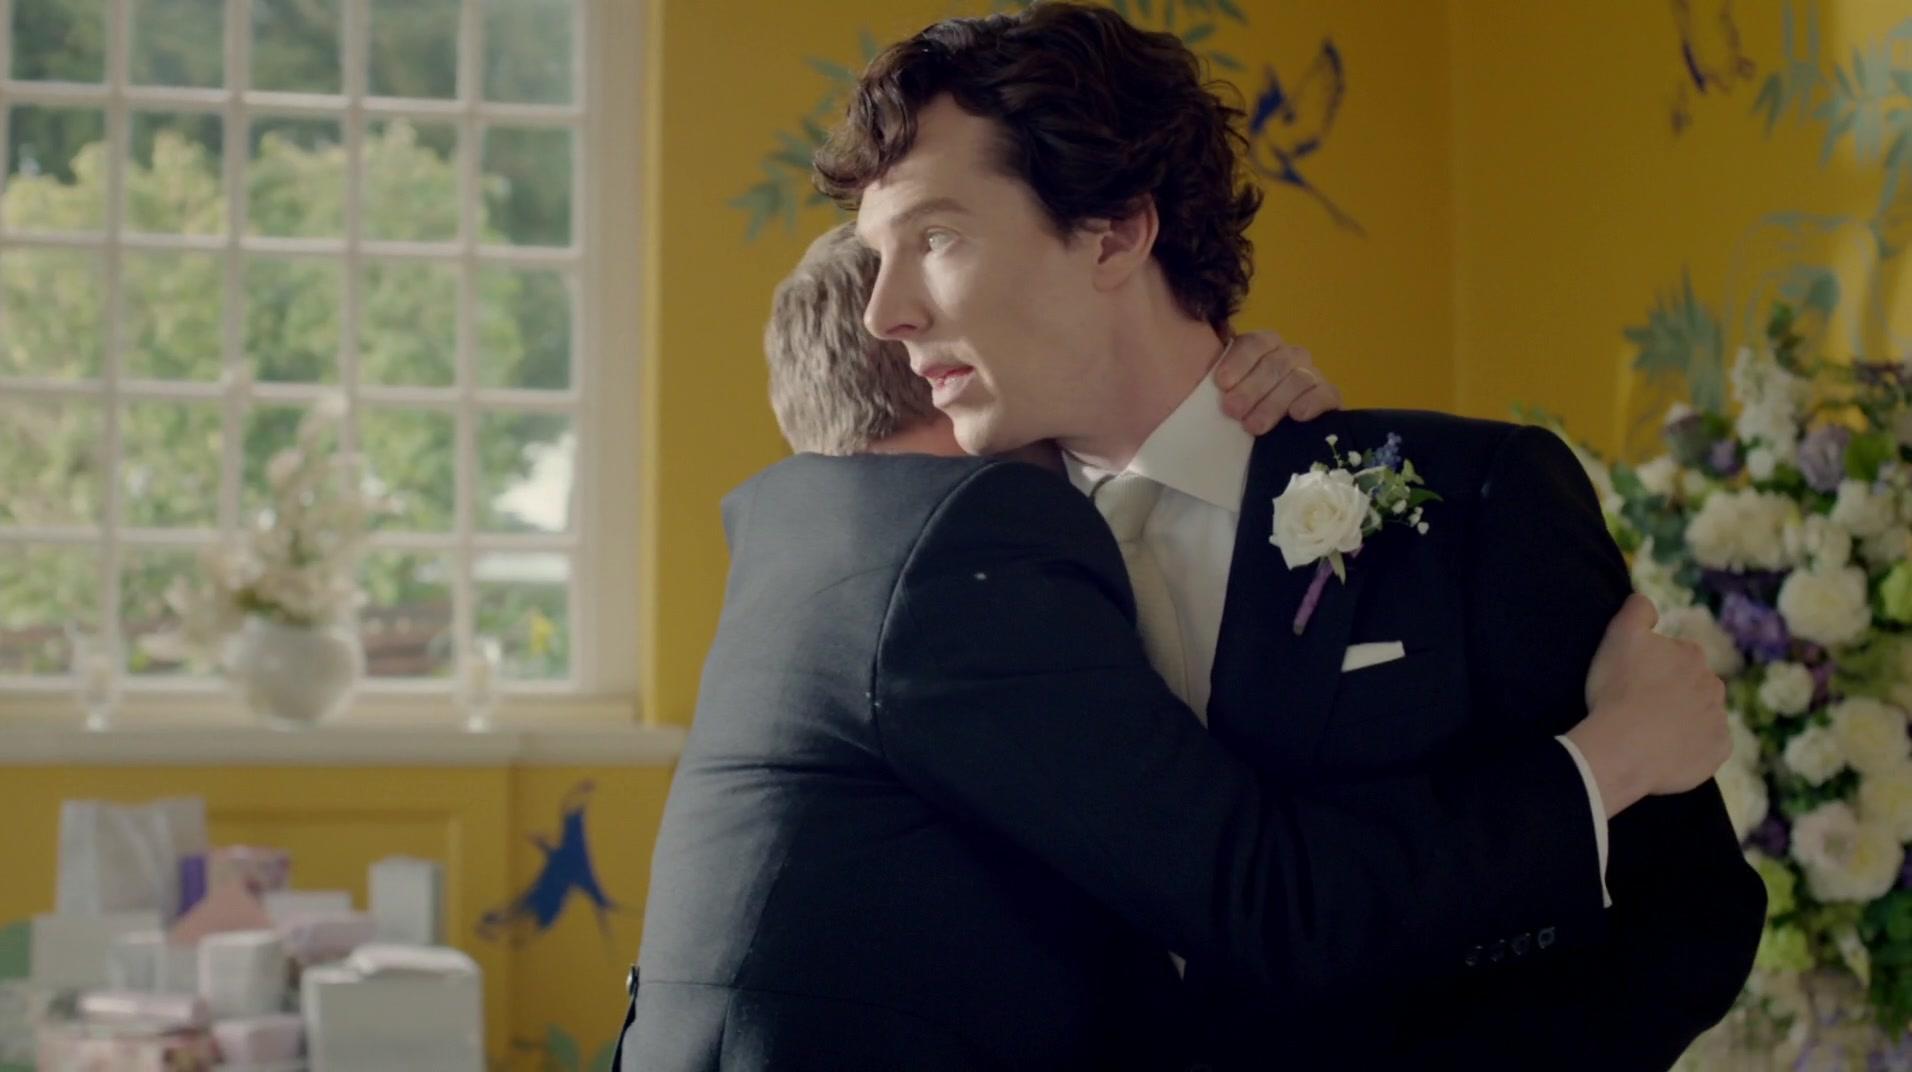 http://kissthemgoodbye.net/sherlock/albums/s3/e02/Sherlock_S03E02_1080p_kissthemgoodbye_net_1573.jpg